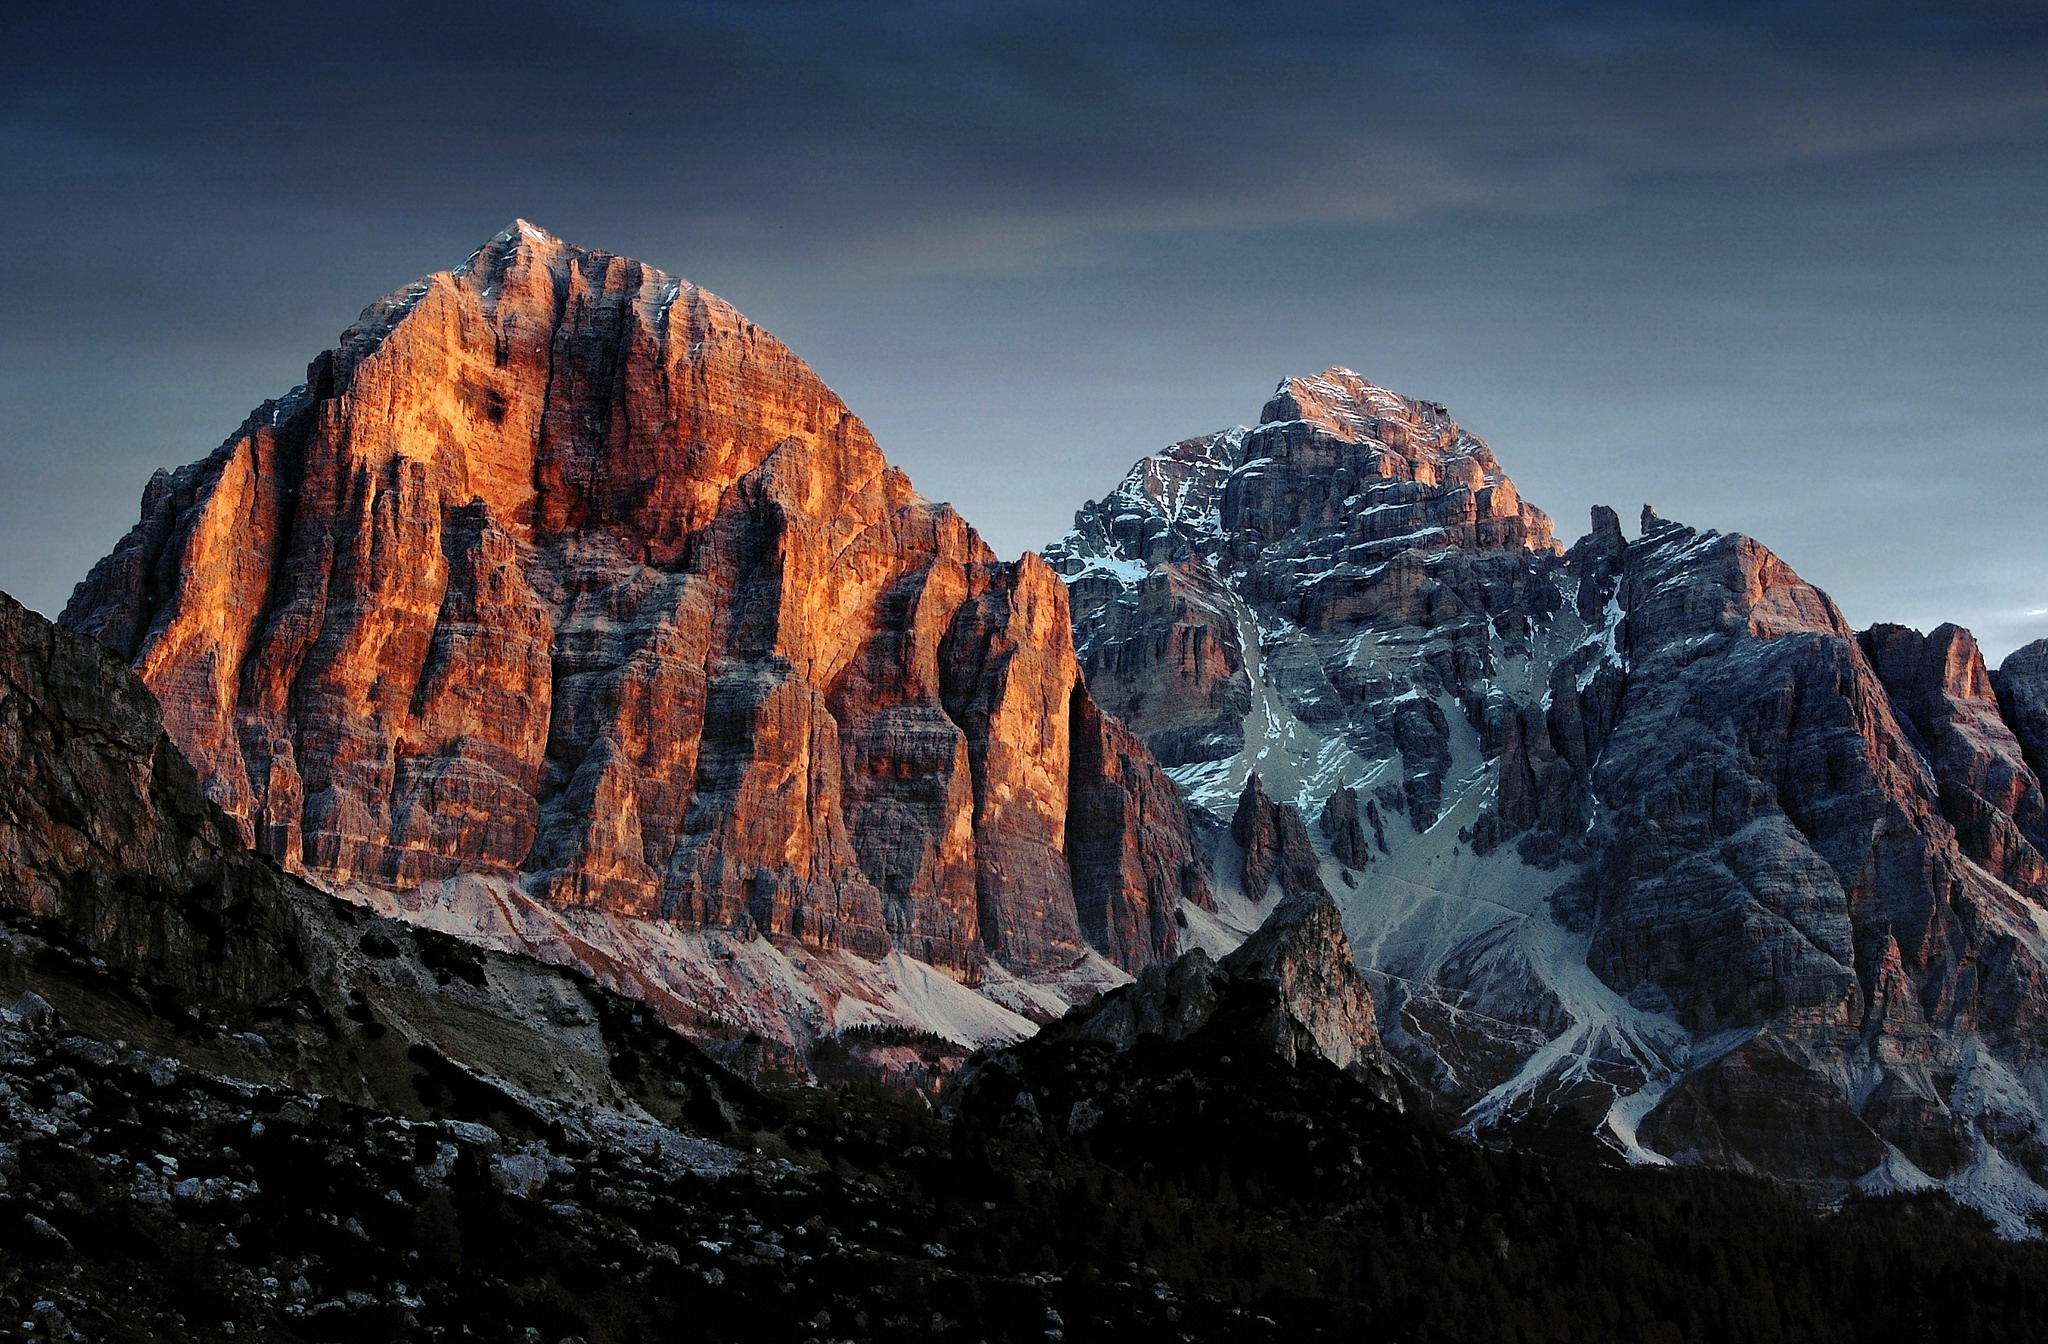 General 2048x1344 nature mountains landscape outdoors Dolomites (mountains) dolomite alps Tofana di Rozes, Italy